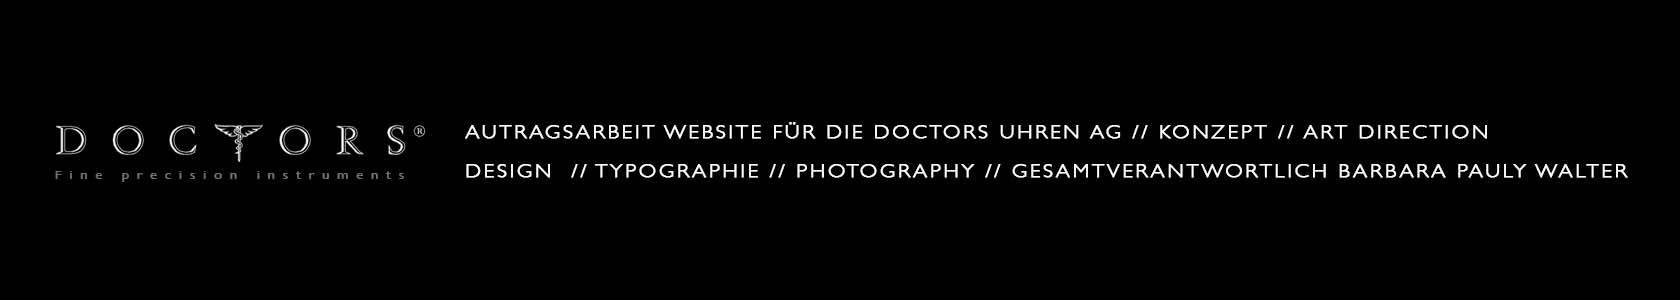 doctors_erlaeuterungen_1